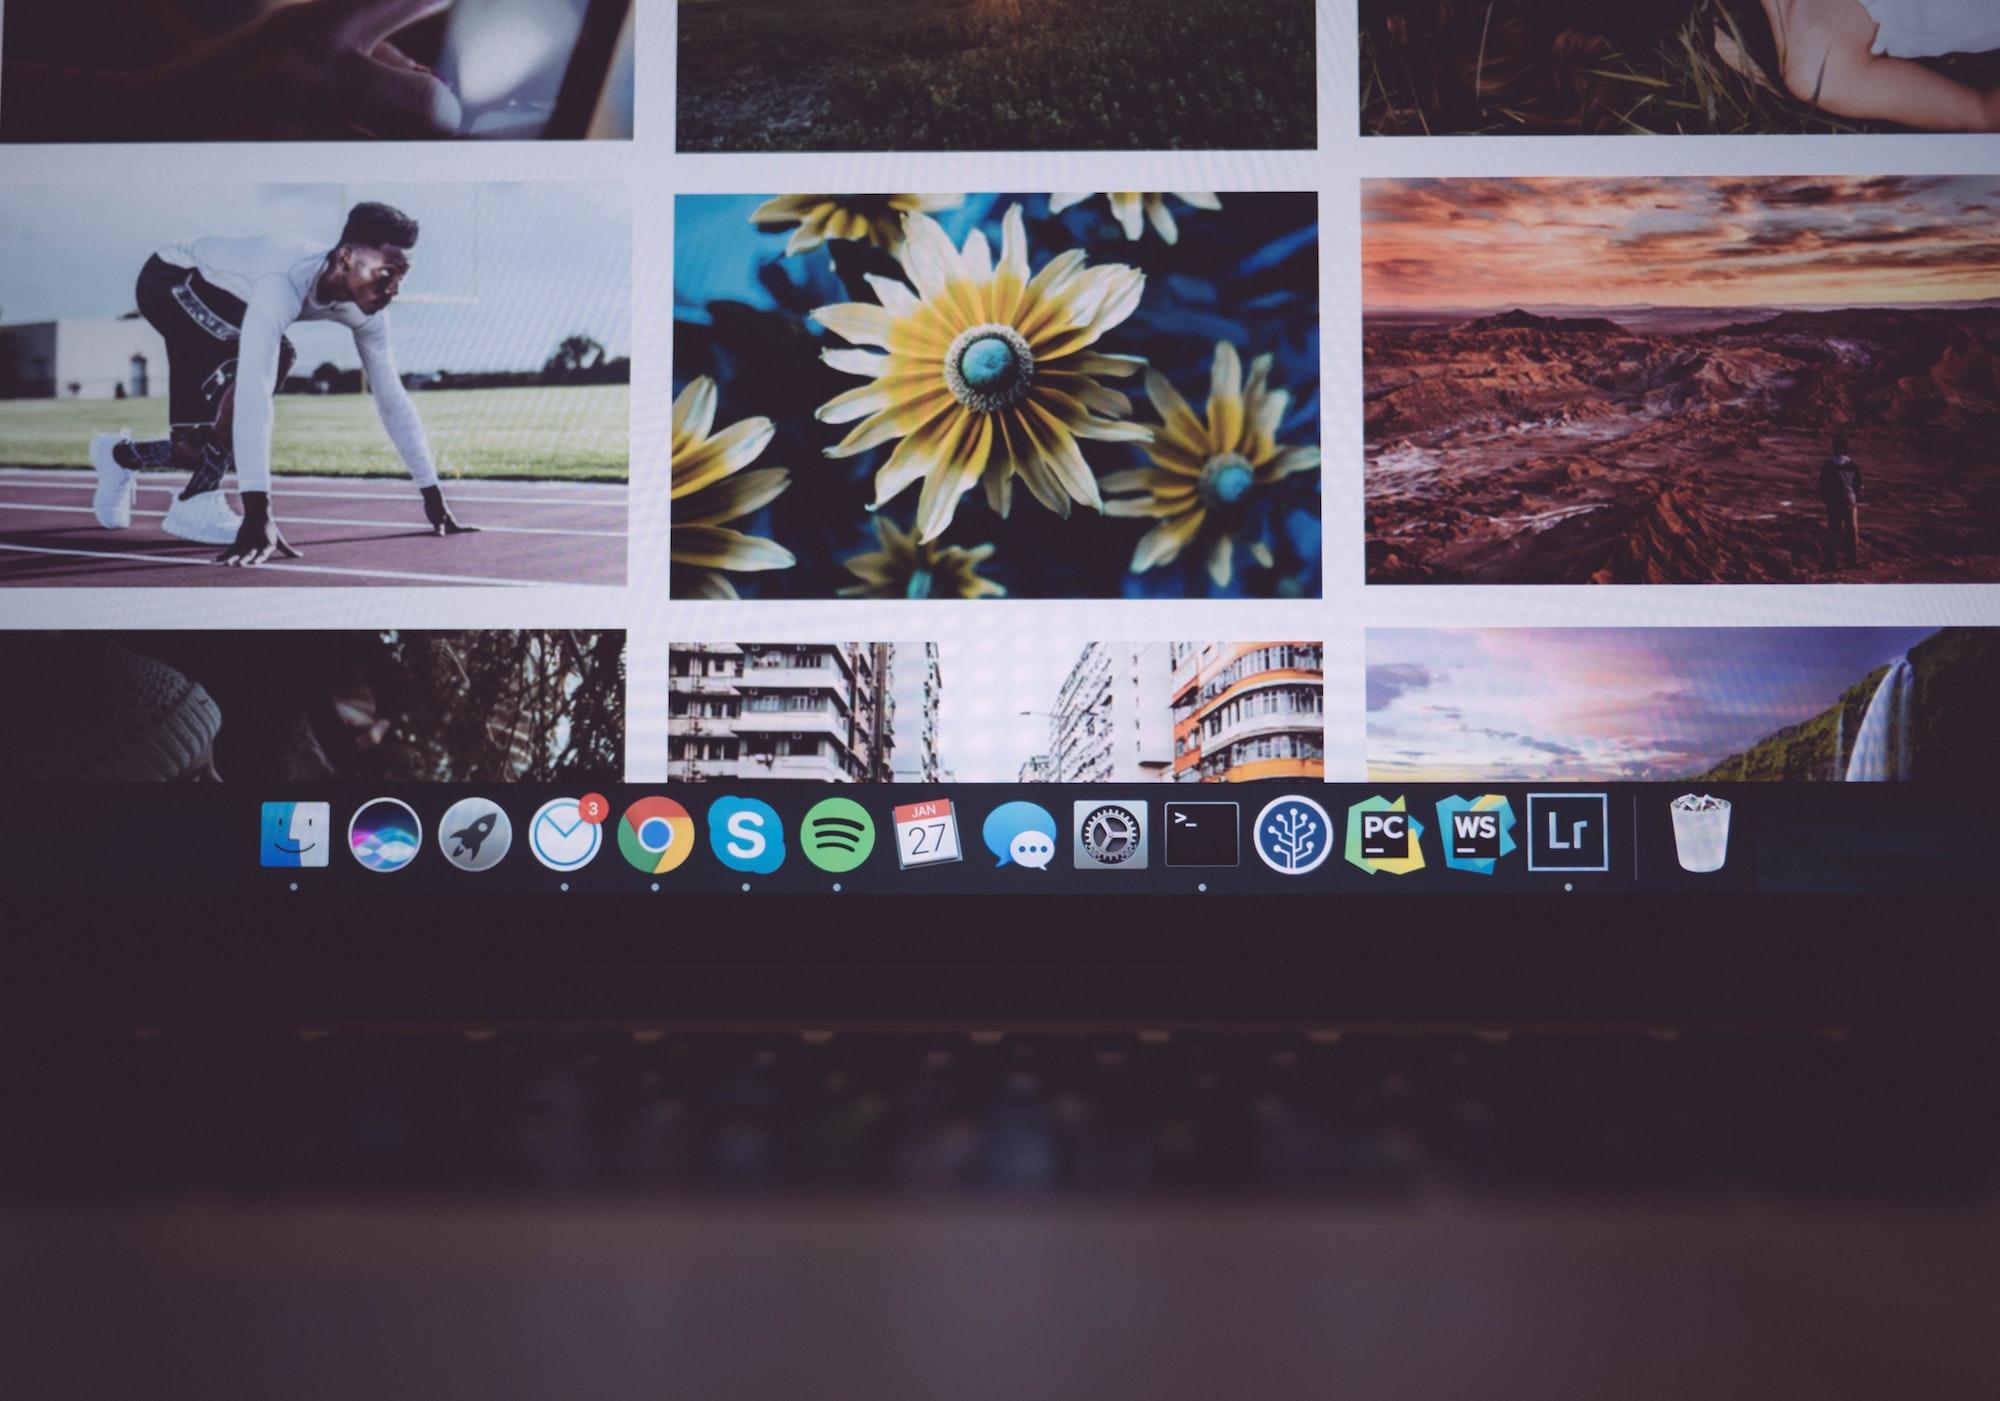 Renaming Photos in Bulk with Python